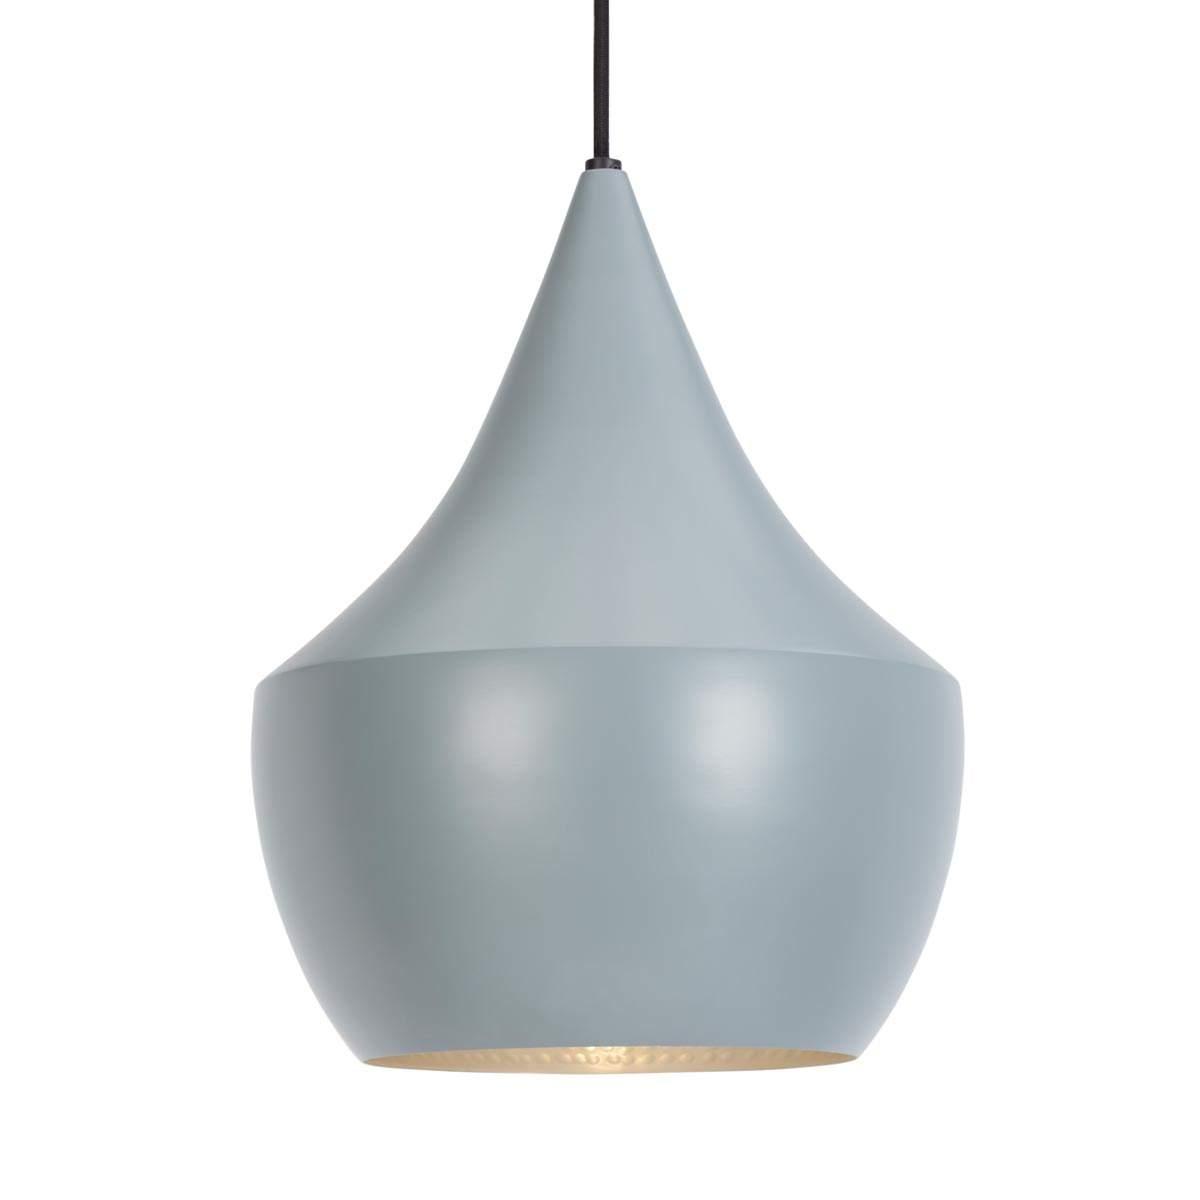 In ottone – lampada a sospensione grigia Beat Fat Illuminazione per interni